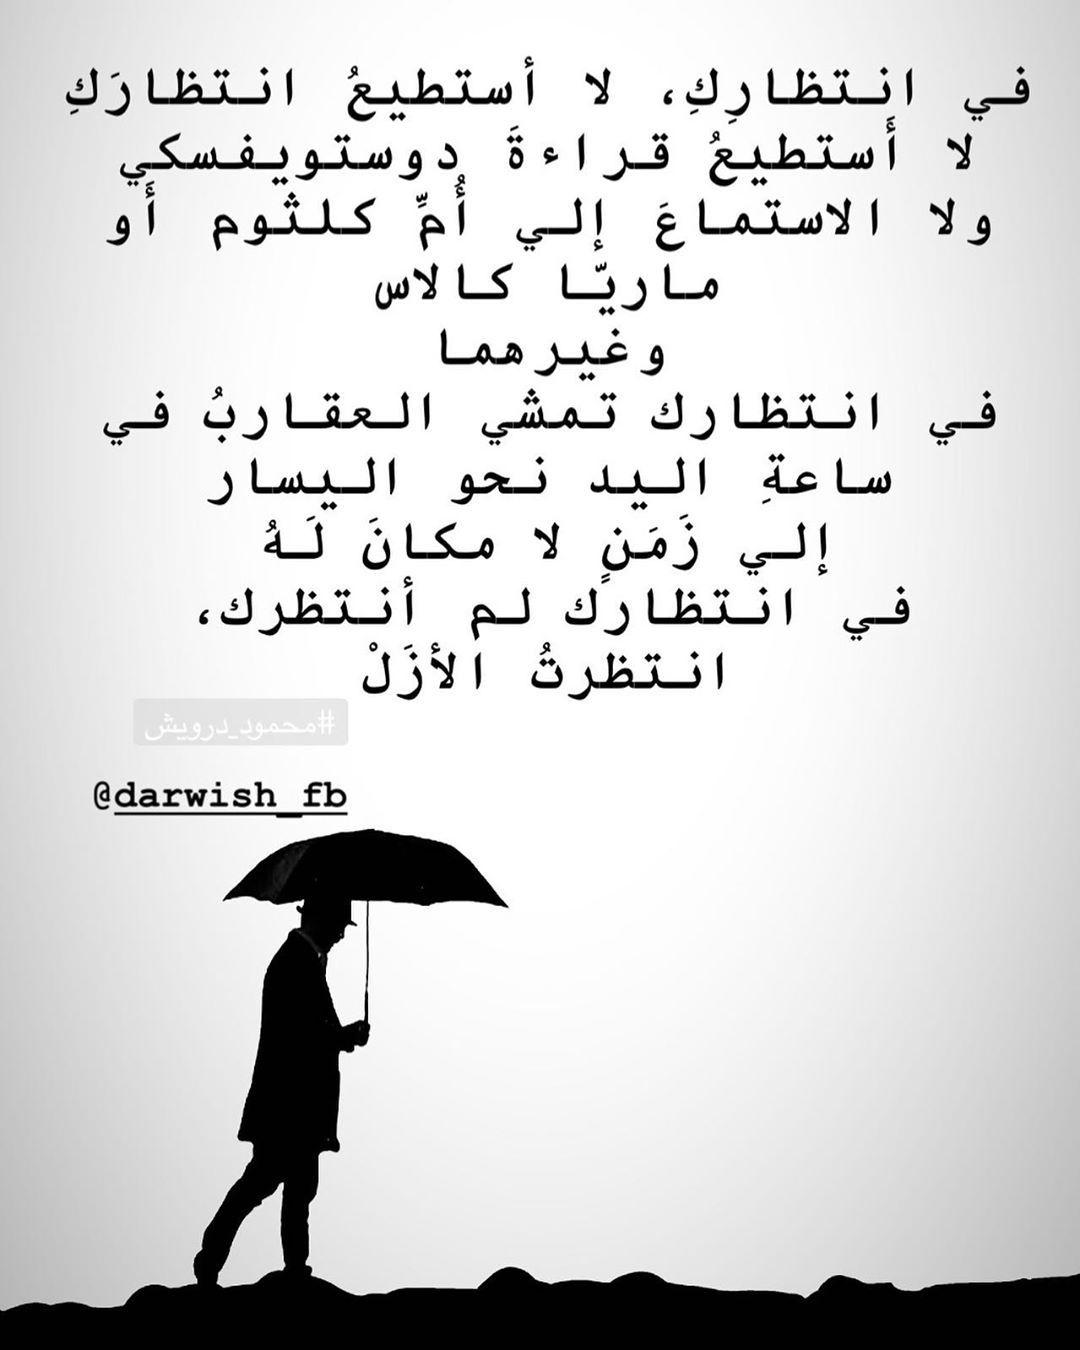 1 130 Mentions J Aime 14 Commentaires Mahmoud Darwish محمود درويش Darwish Fb Sur Instagram في انتظار ك لا أستطيع انت Home Decor Decals Math Decor